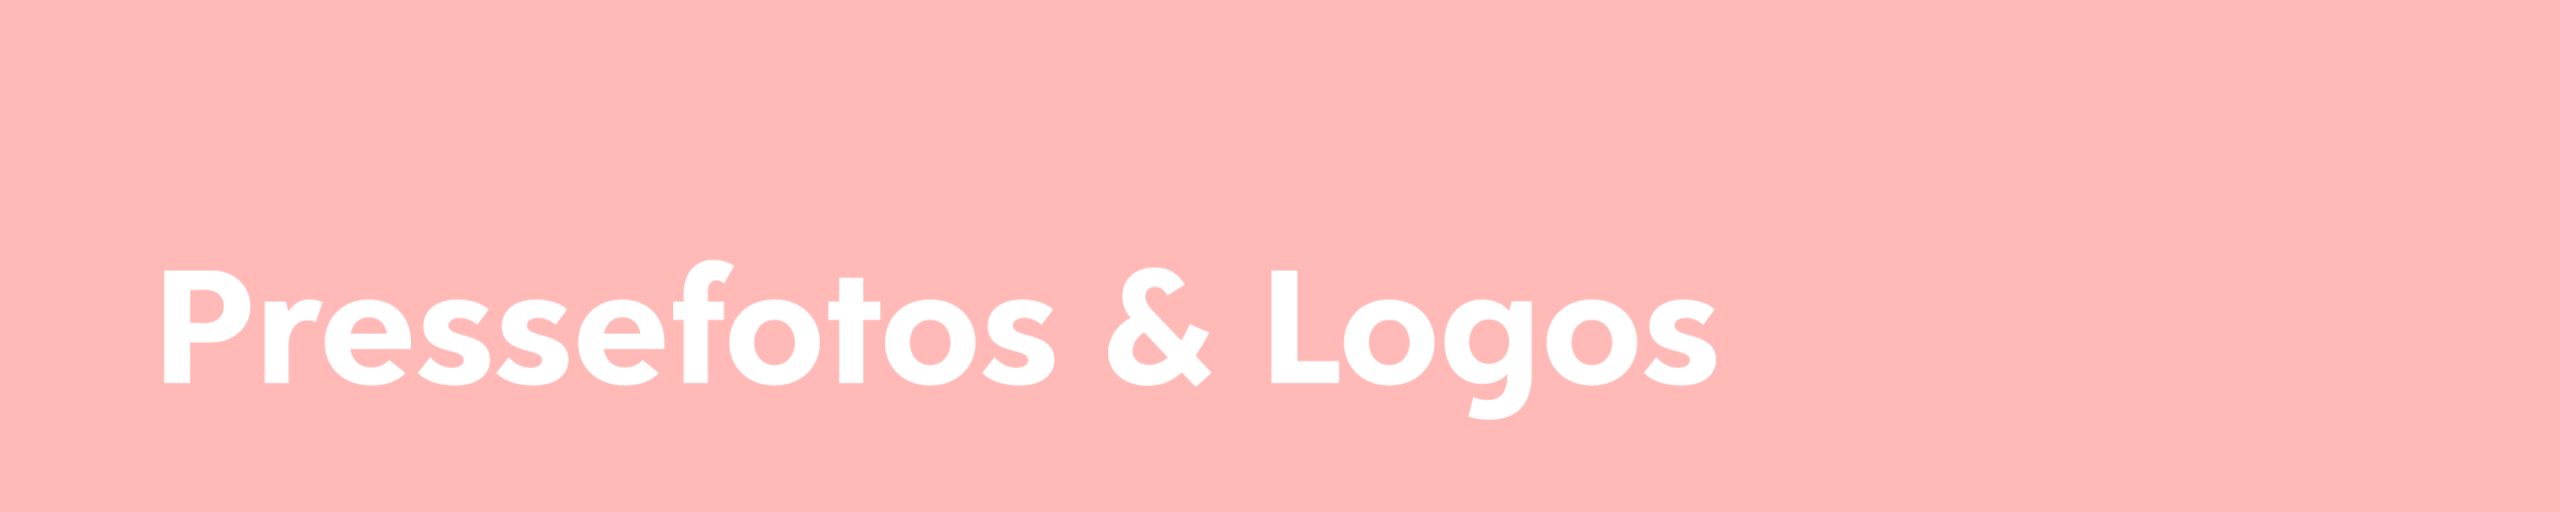 Pressefotos-Logos